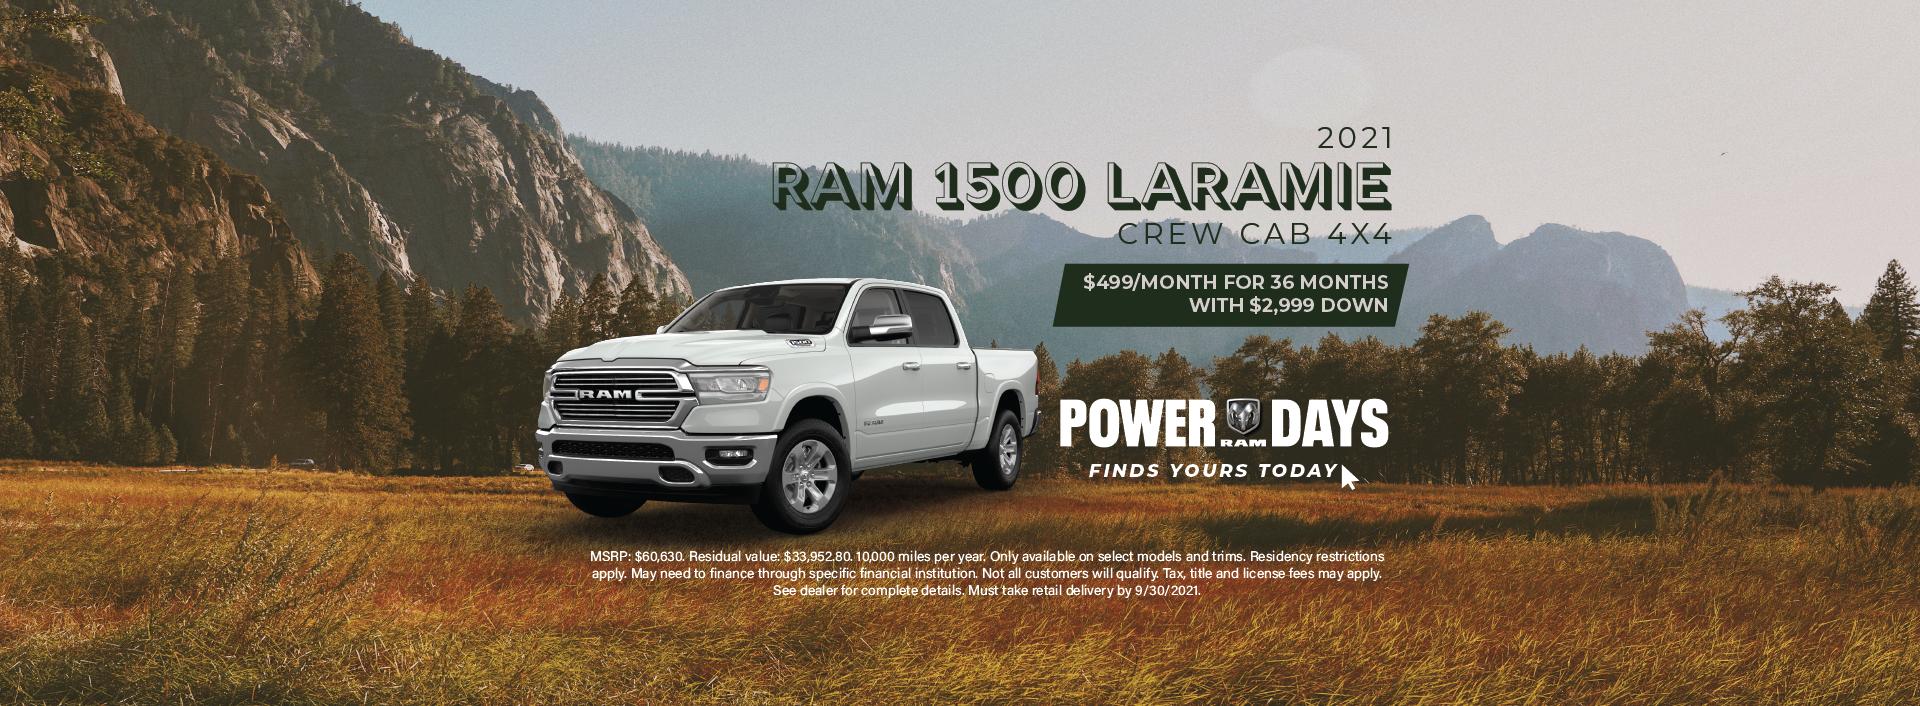 1500 Laramie – Petersons Sept 2021